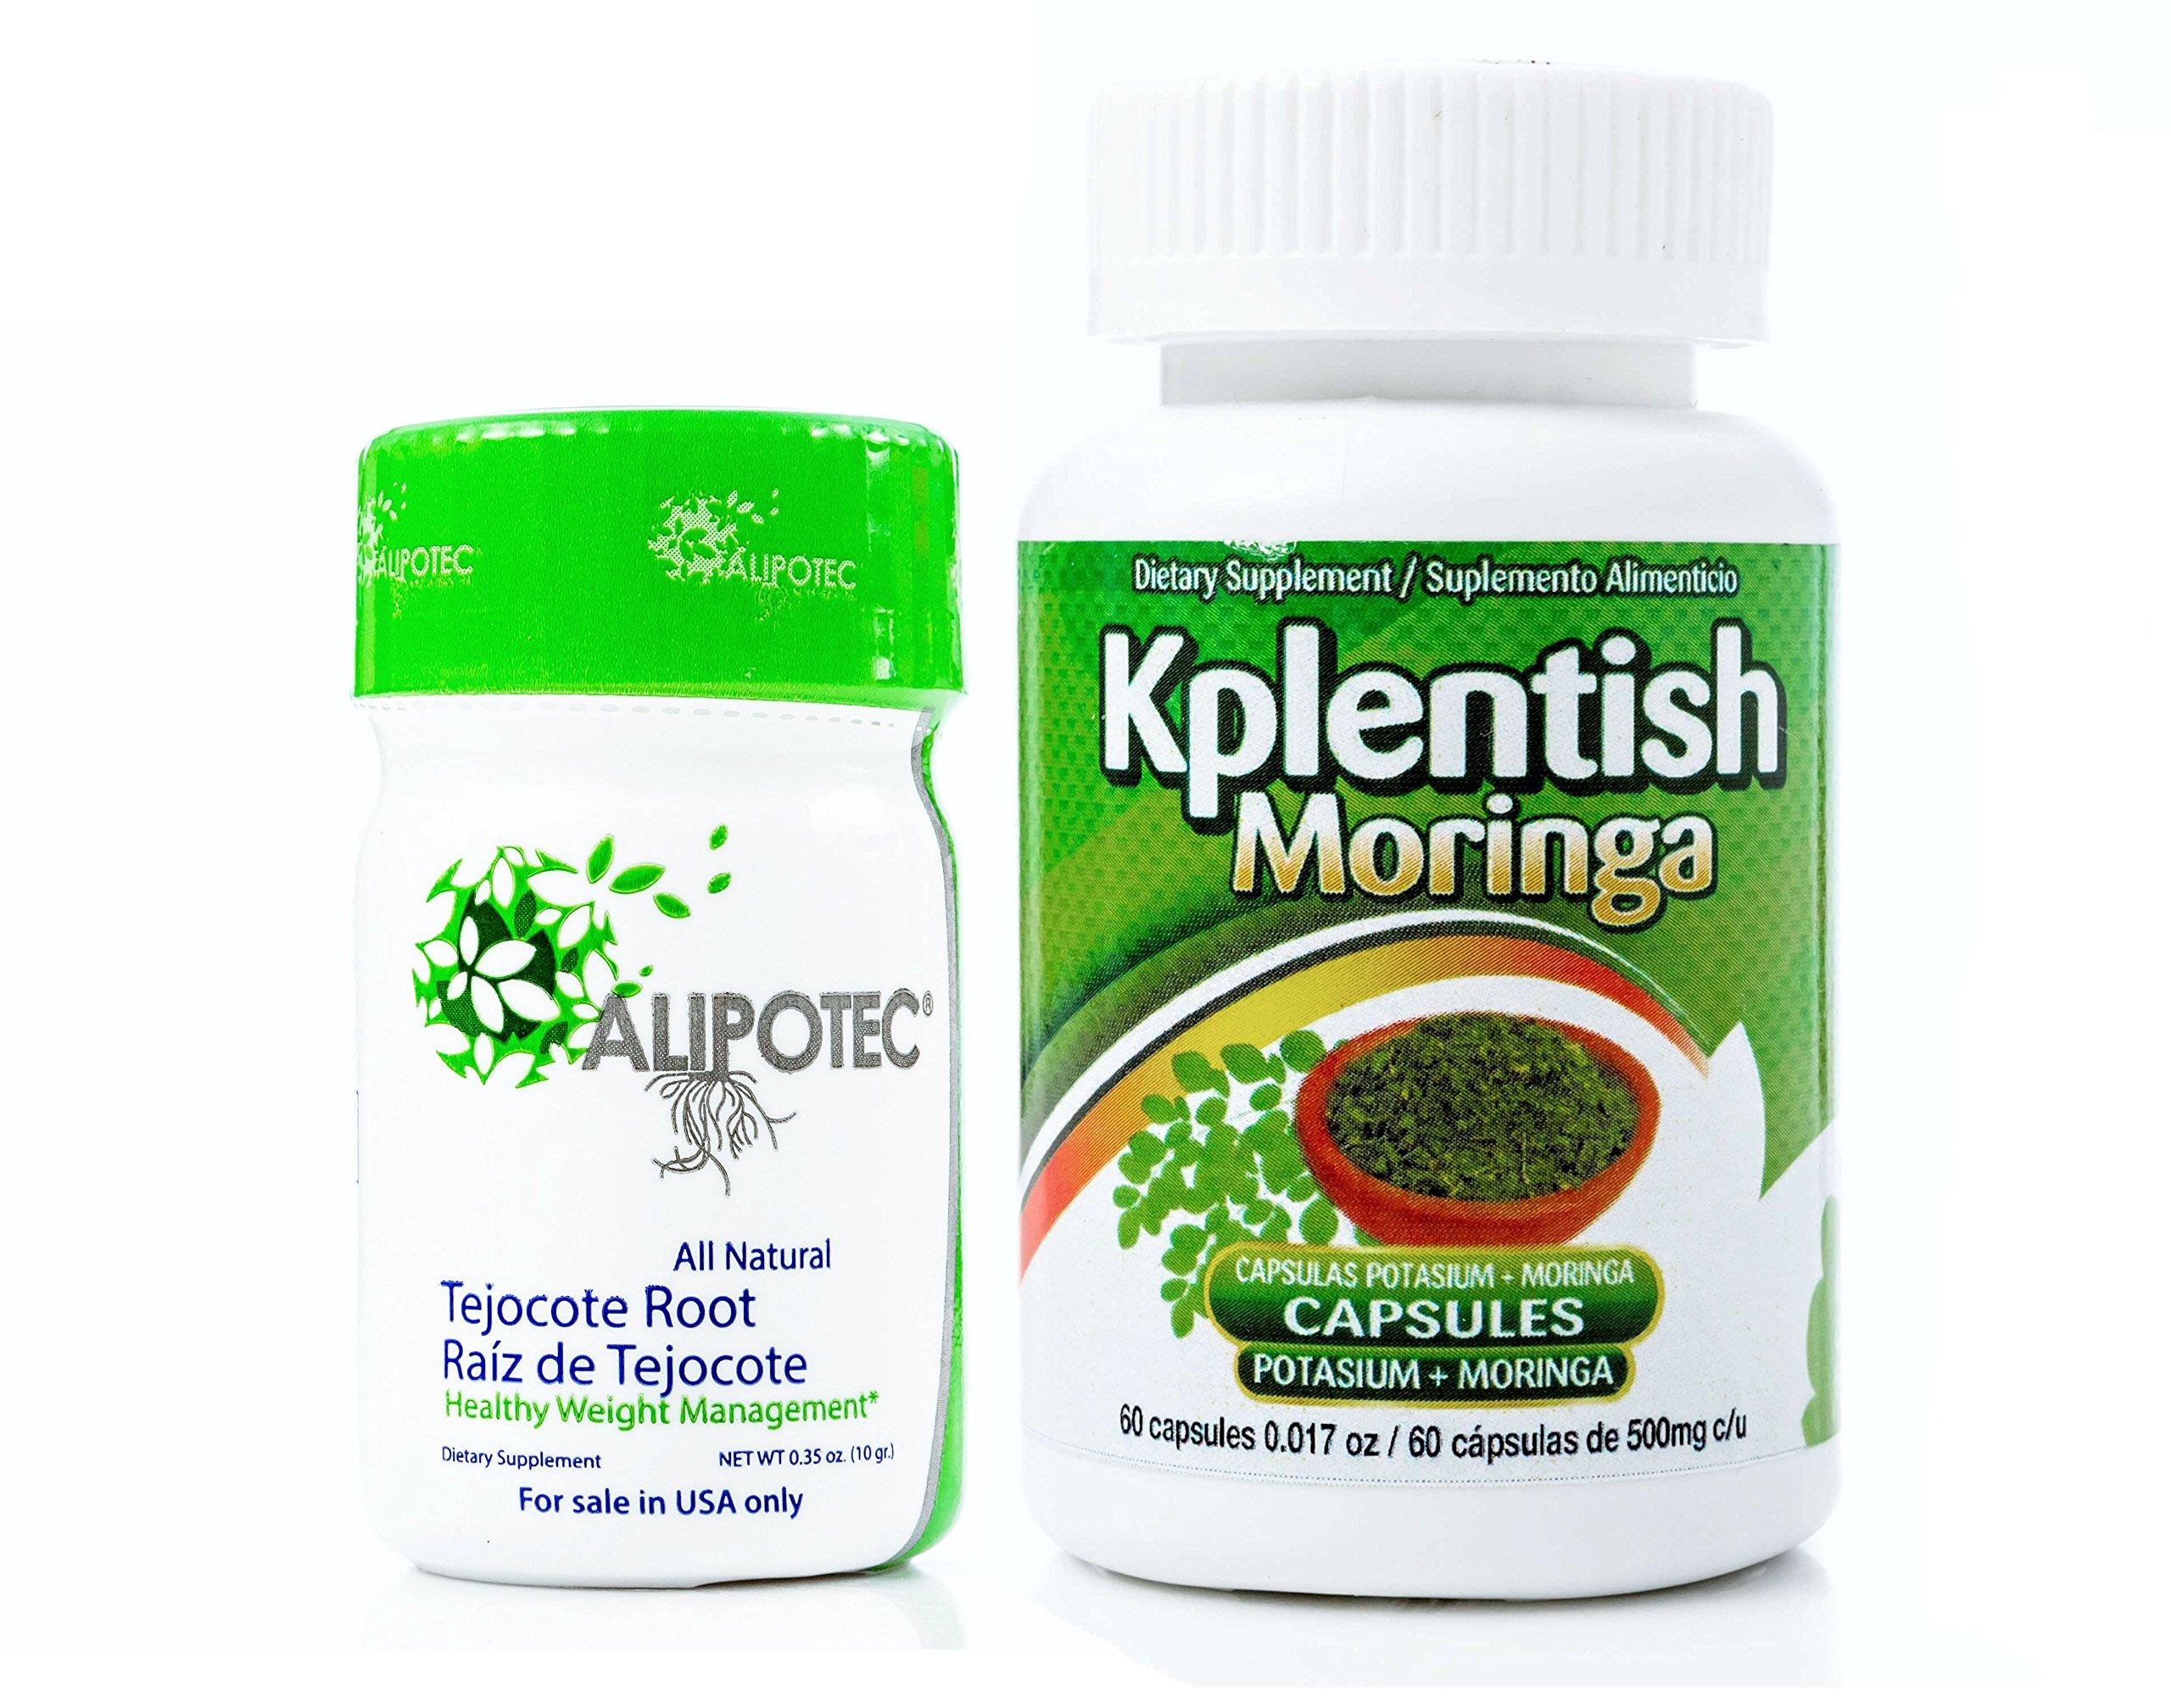 Alipotec Root Raiz de Tejocote 90 Day Supply and 30 Day KPlentish Moringa Potassium Supplement 2 Product Pack by ALIPOTEC Tejocote